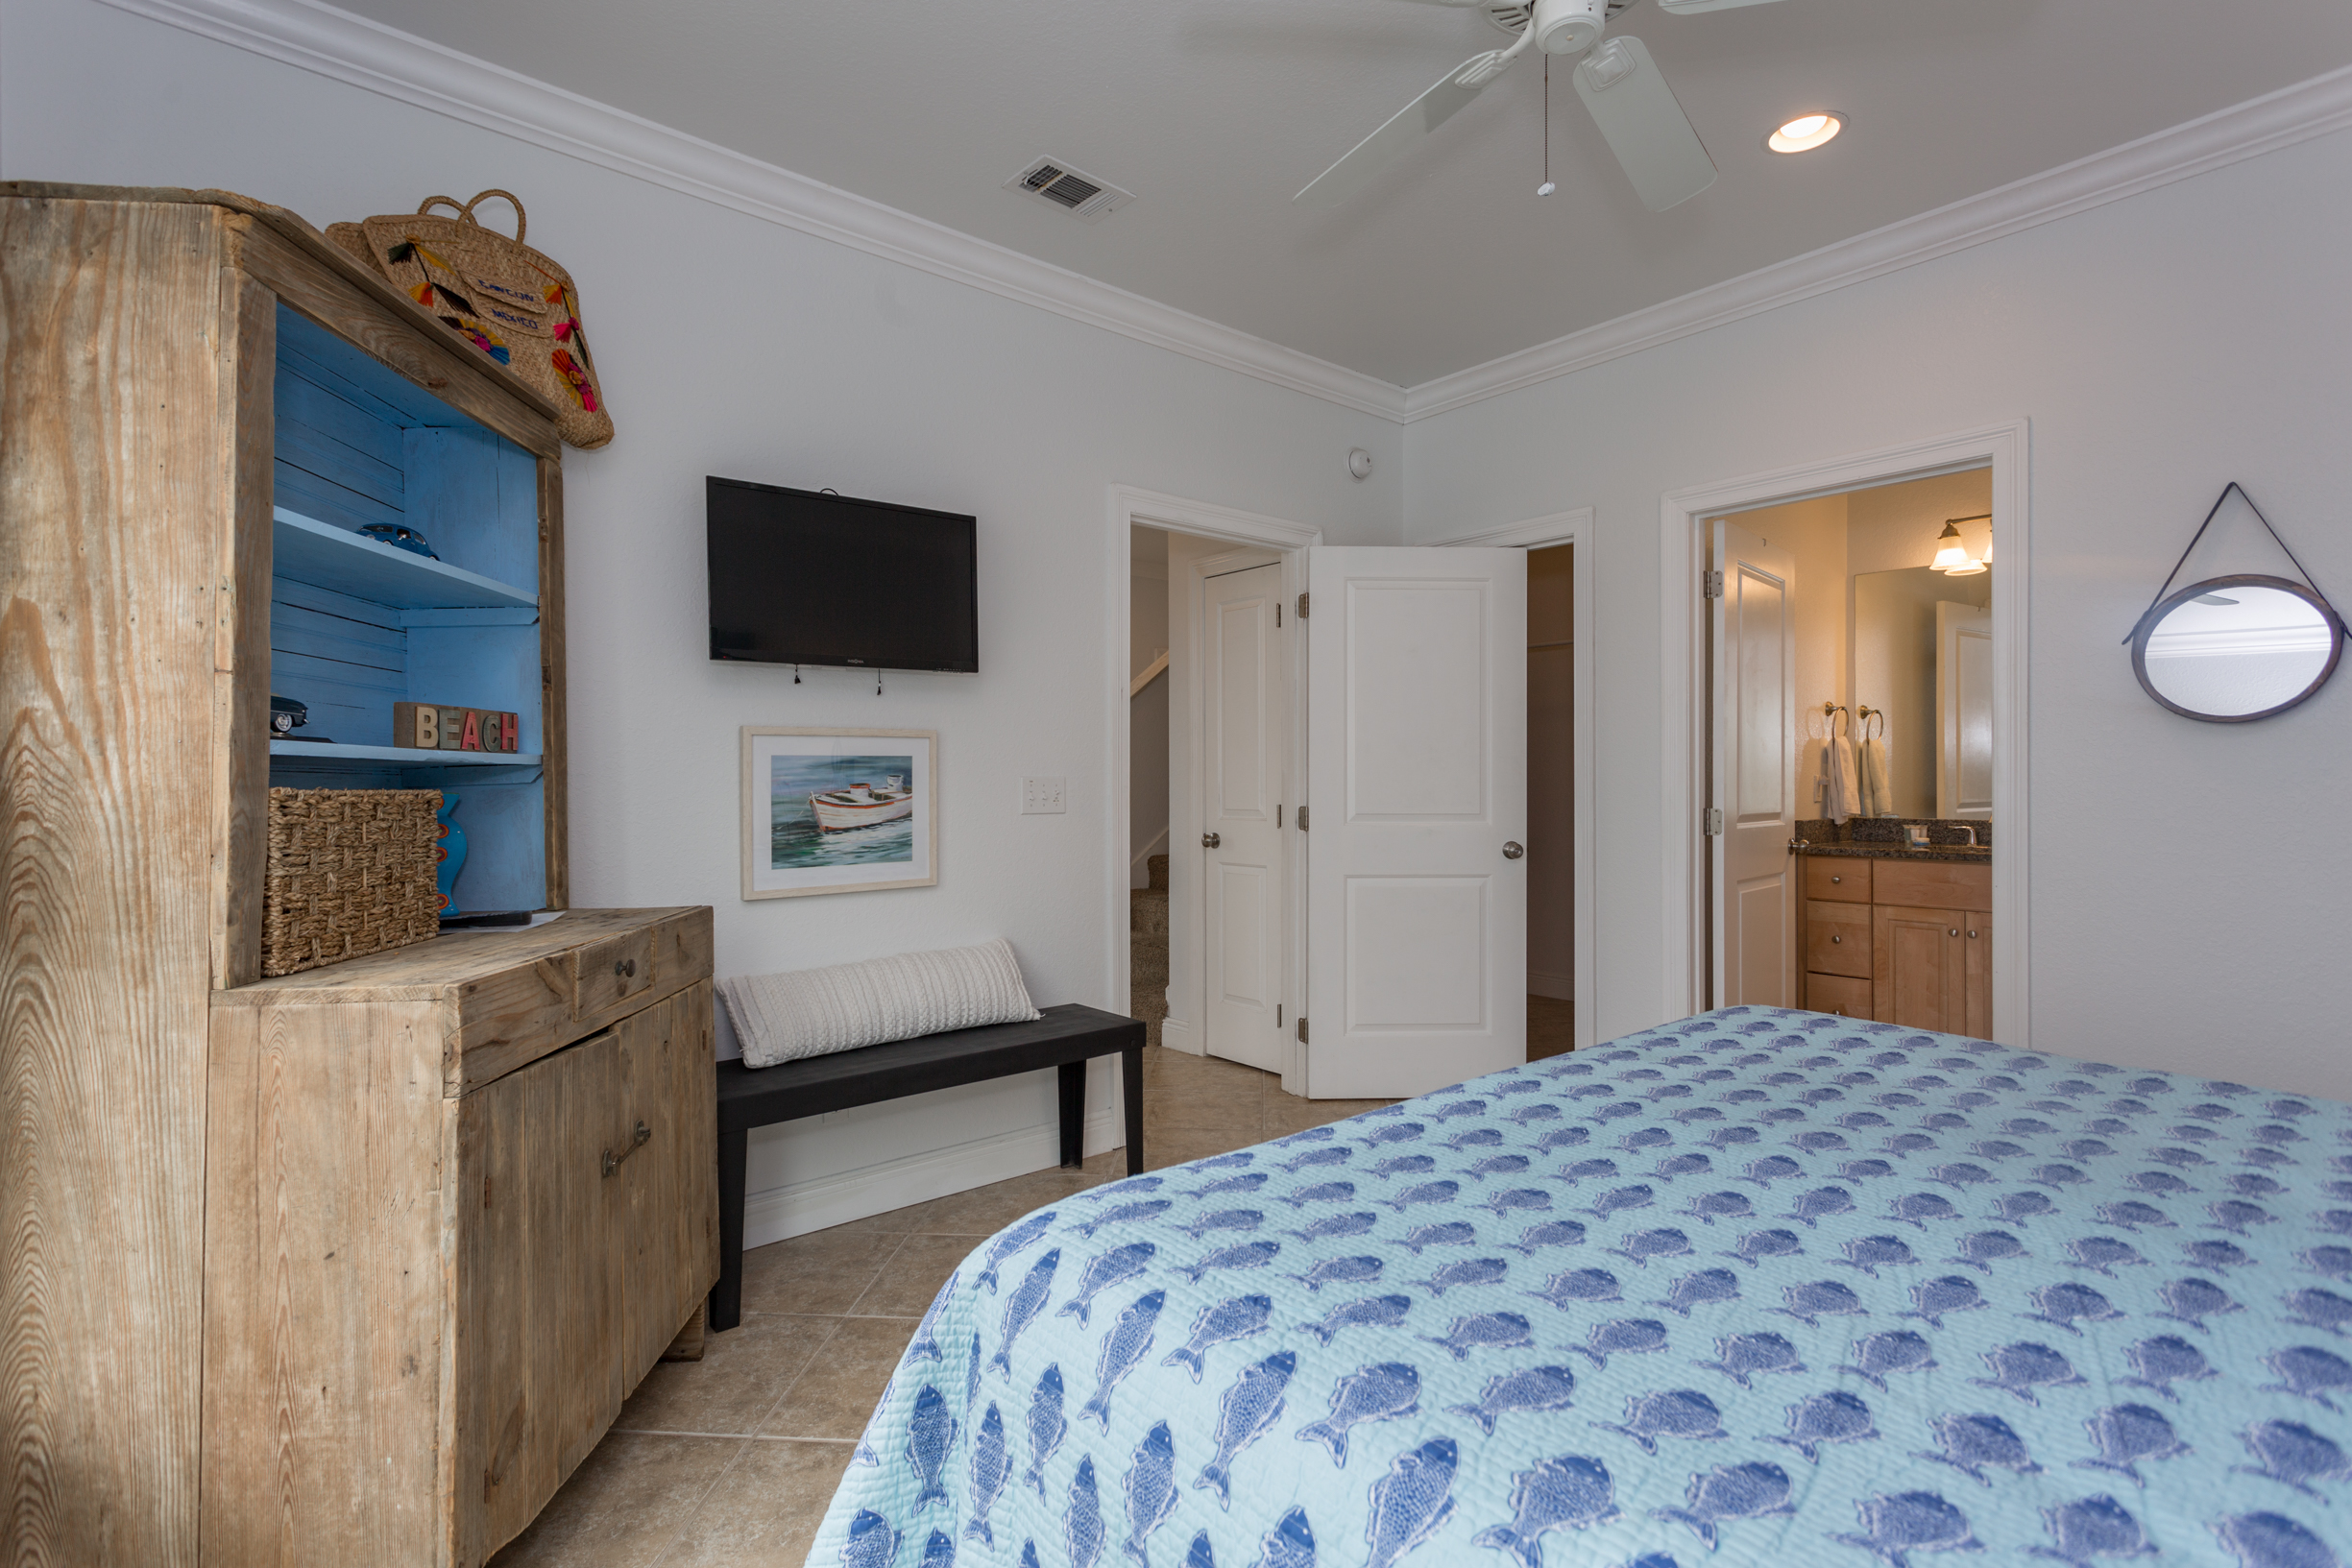 Ariola 1003 - The Starfish House House/Cottage rental in Pensacola Beach House Rentals in Pensacola Beach Florida - #24